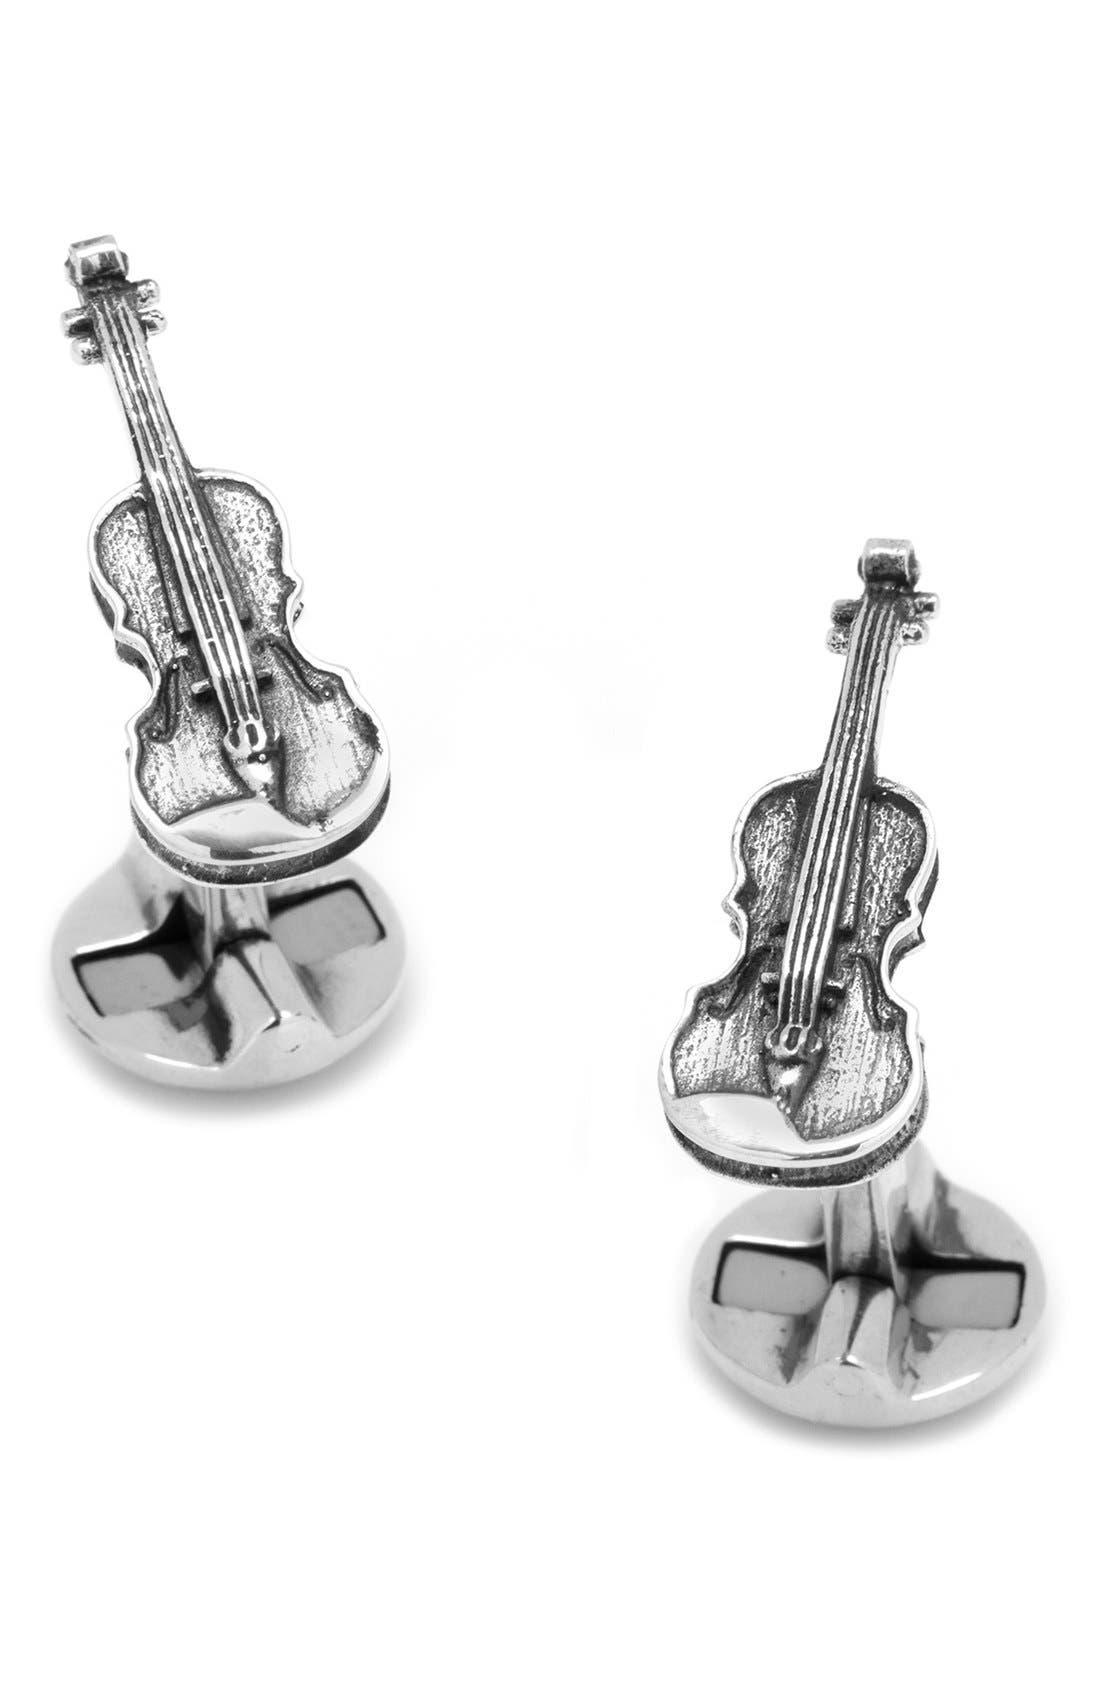 Violin Cuff Links,                             Main thumbnail 1, color,                             Silver